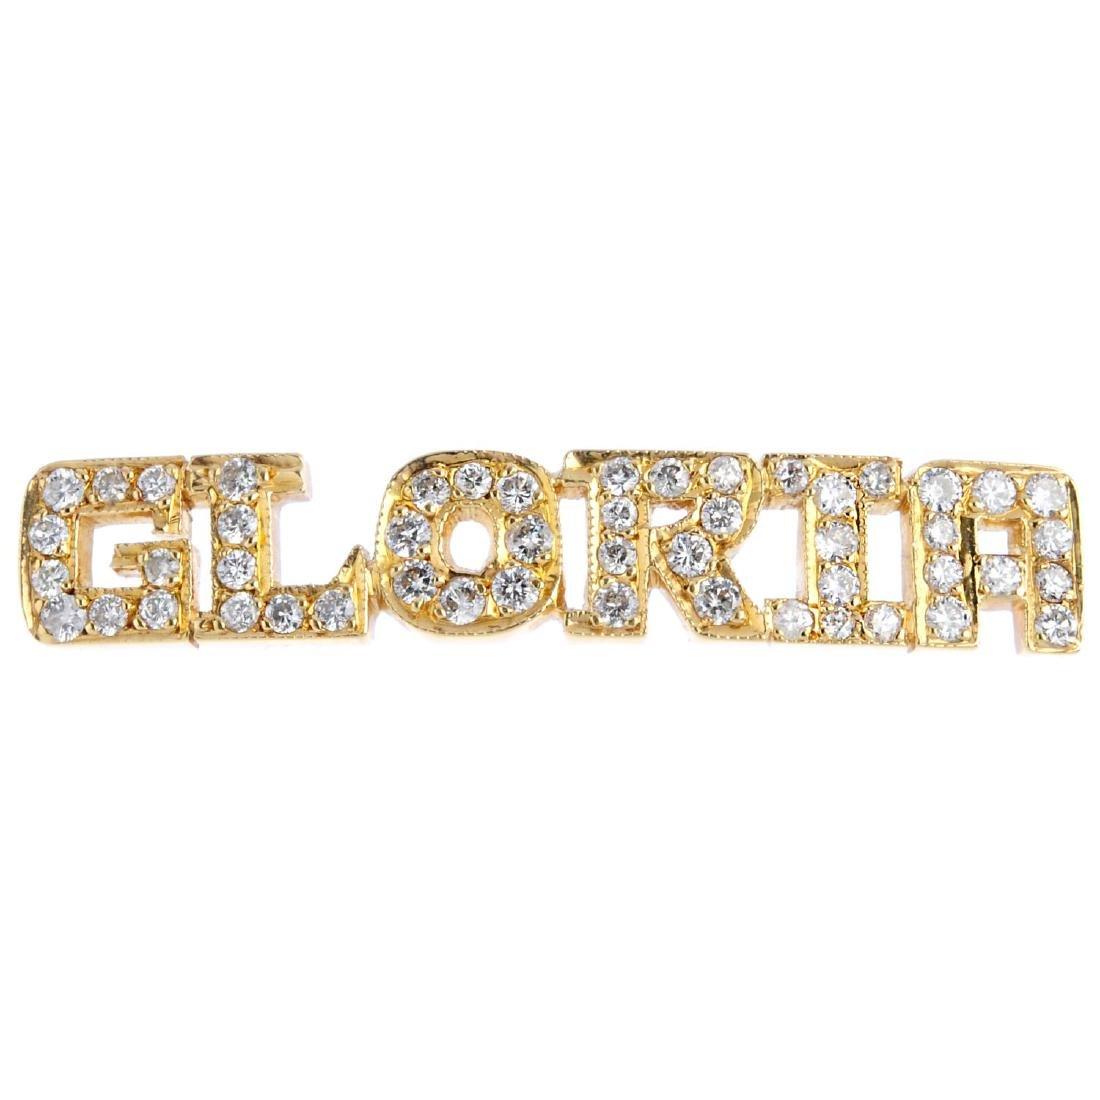 A diamond nameplate. The brilliant-cut diamond script